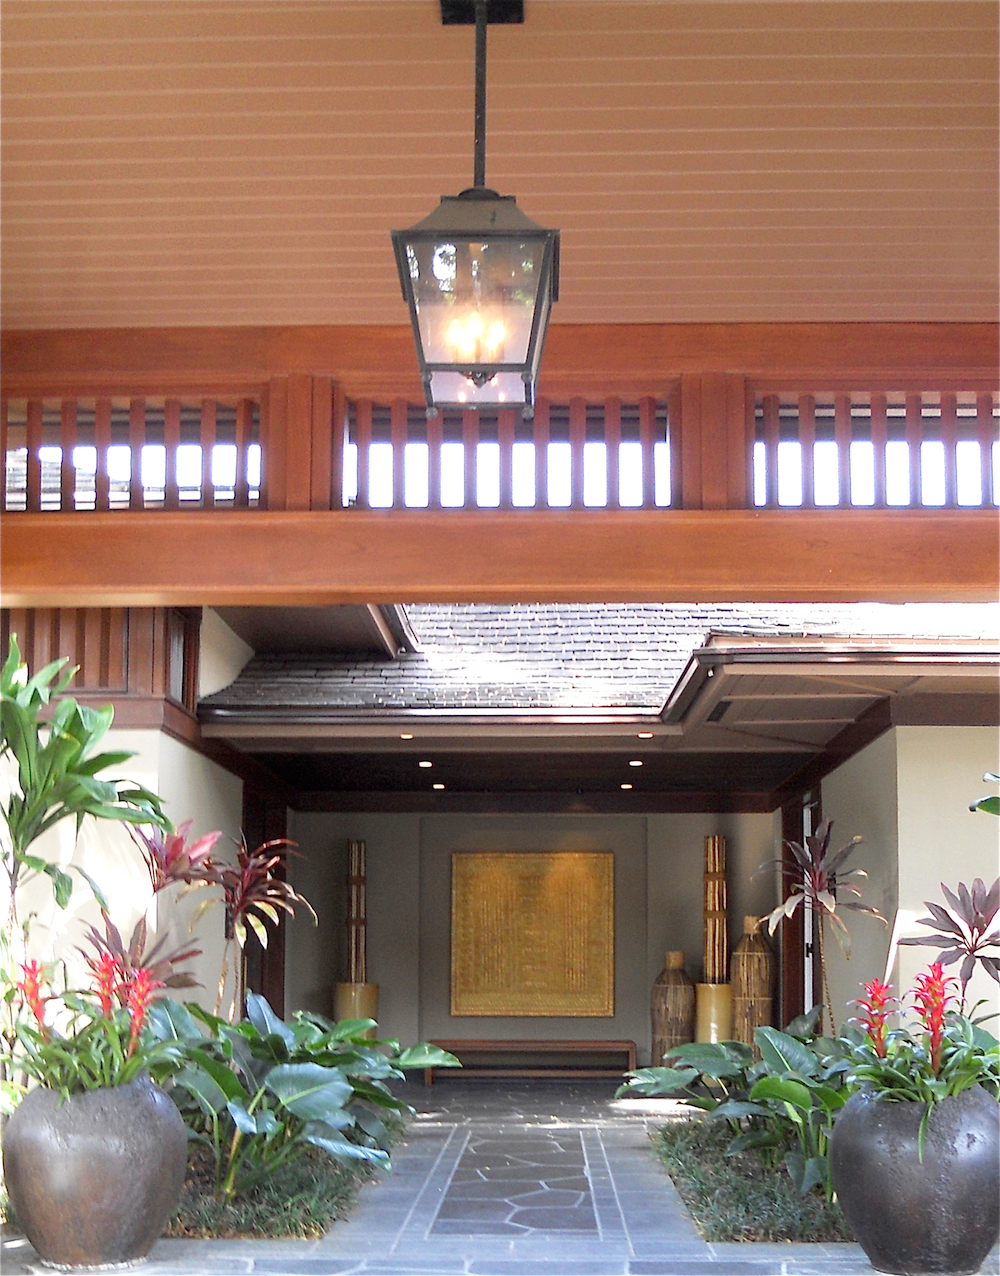 The Four Seasons Resort Hualalai - Entry Hualalai Spa and Seaside Beach boutique